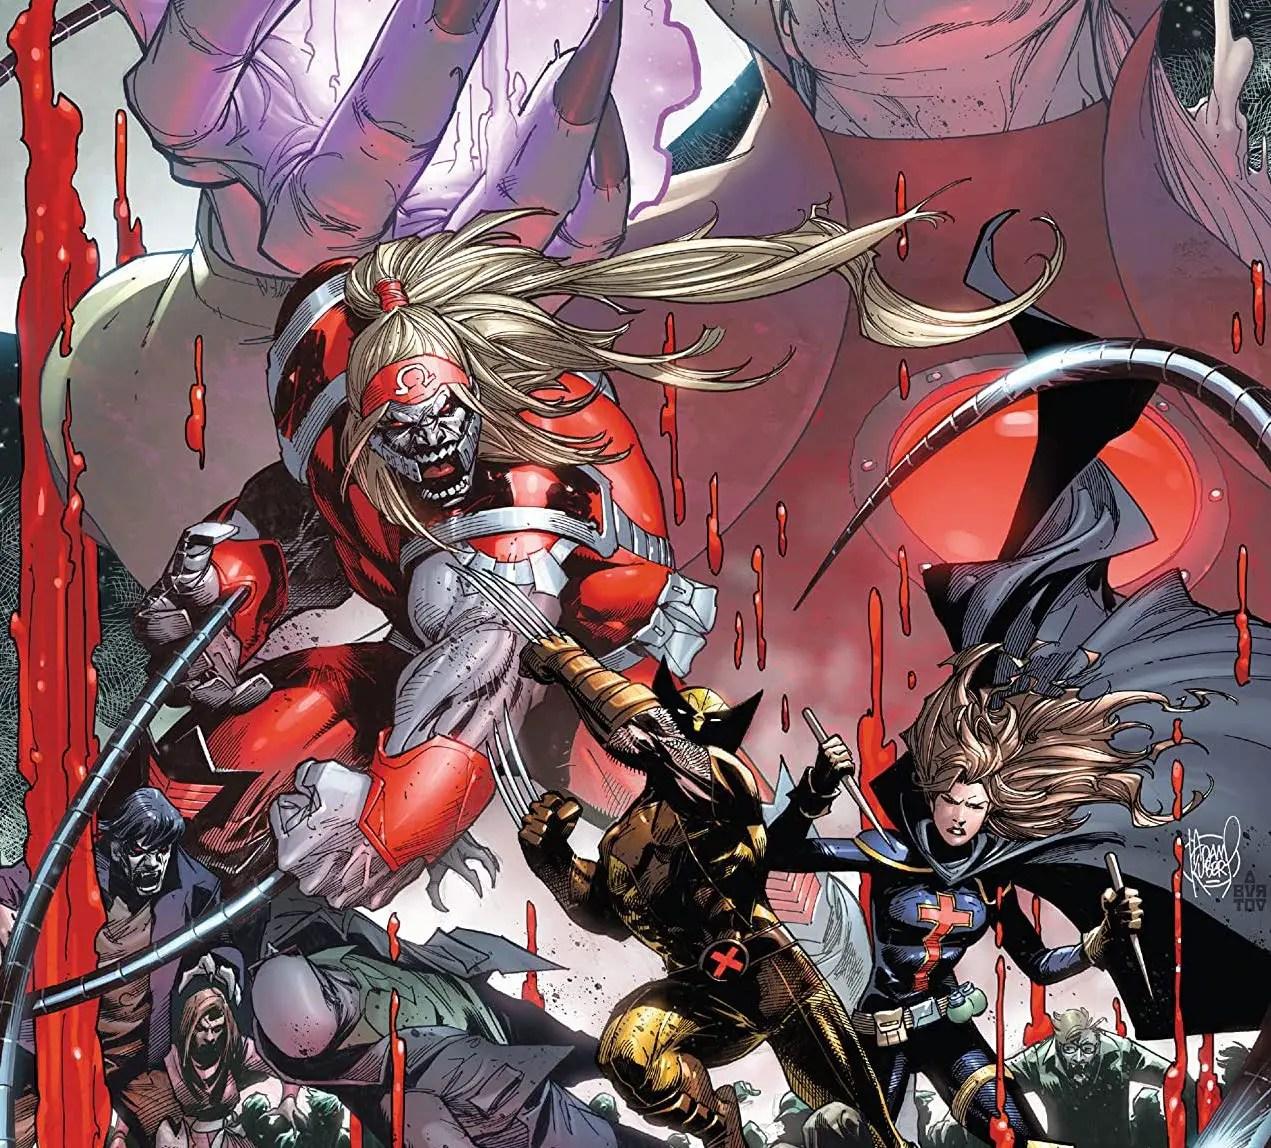 'Wolverine' #11 connects Dracula to Krakoa